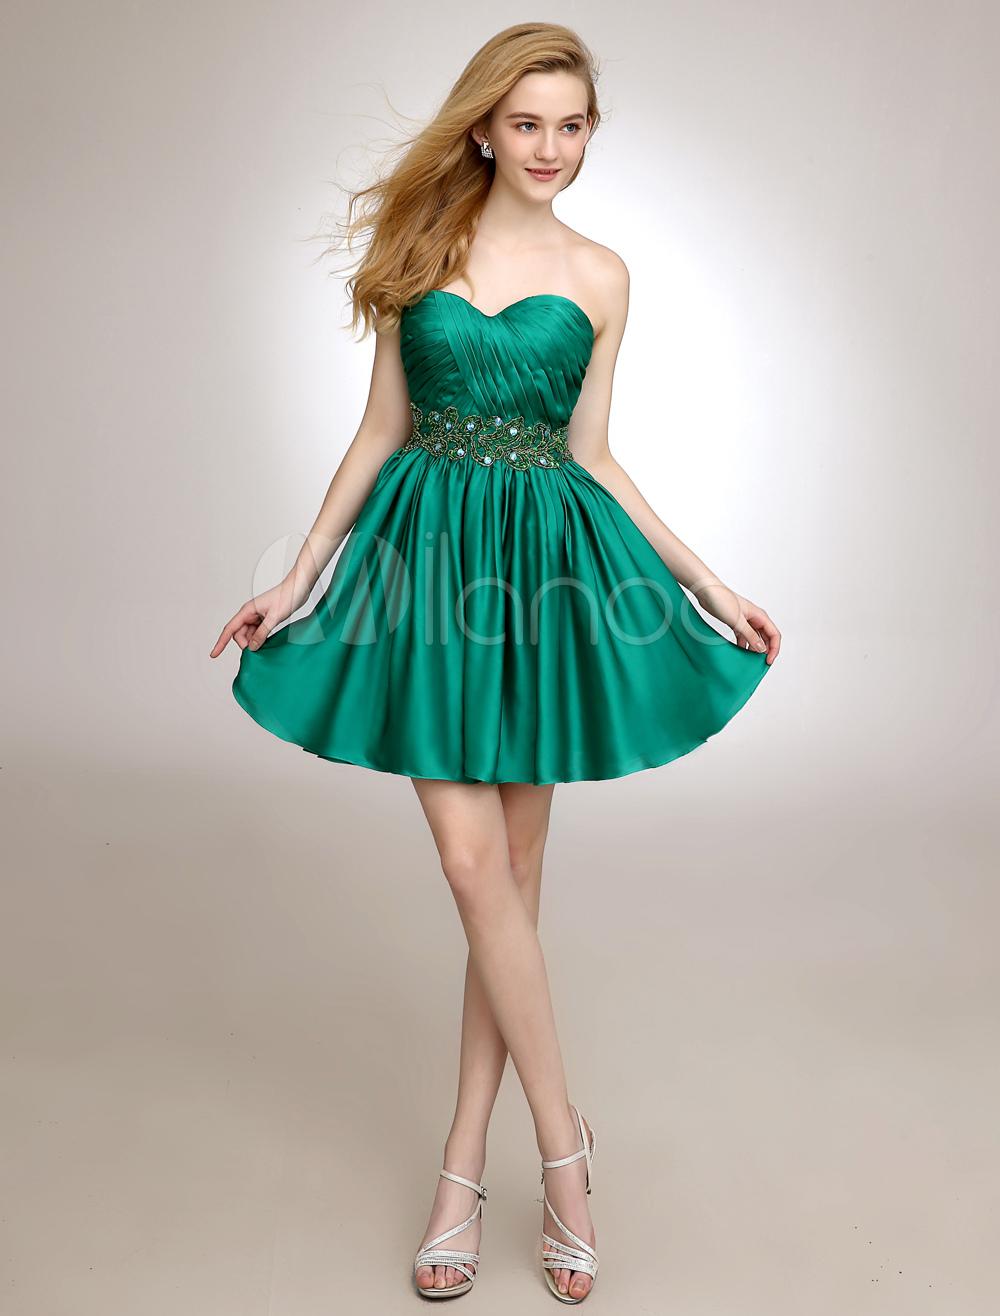 Short Sweetheart Homecoming Dress With Draped Chiffon